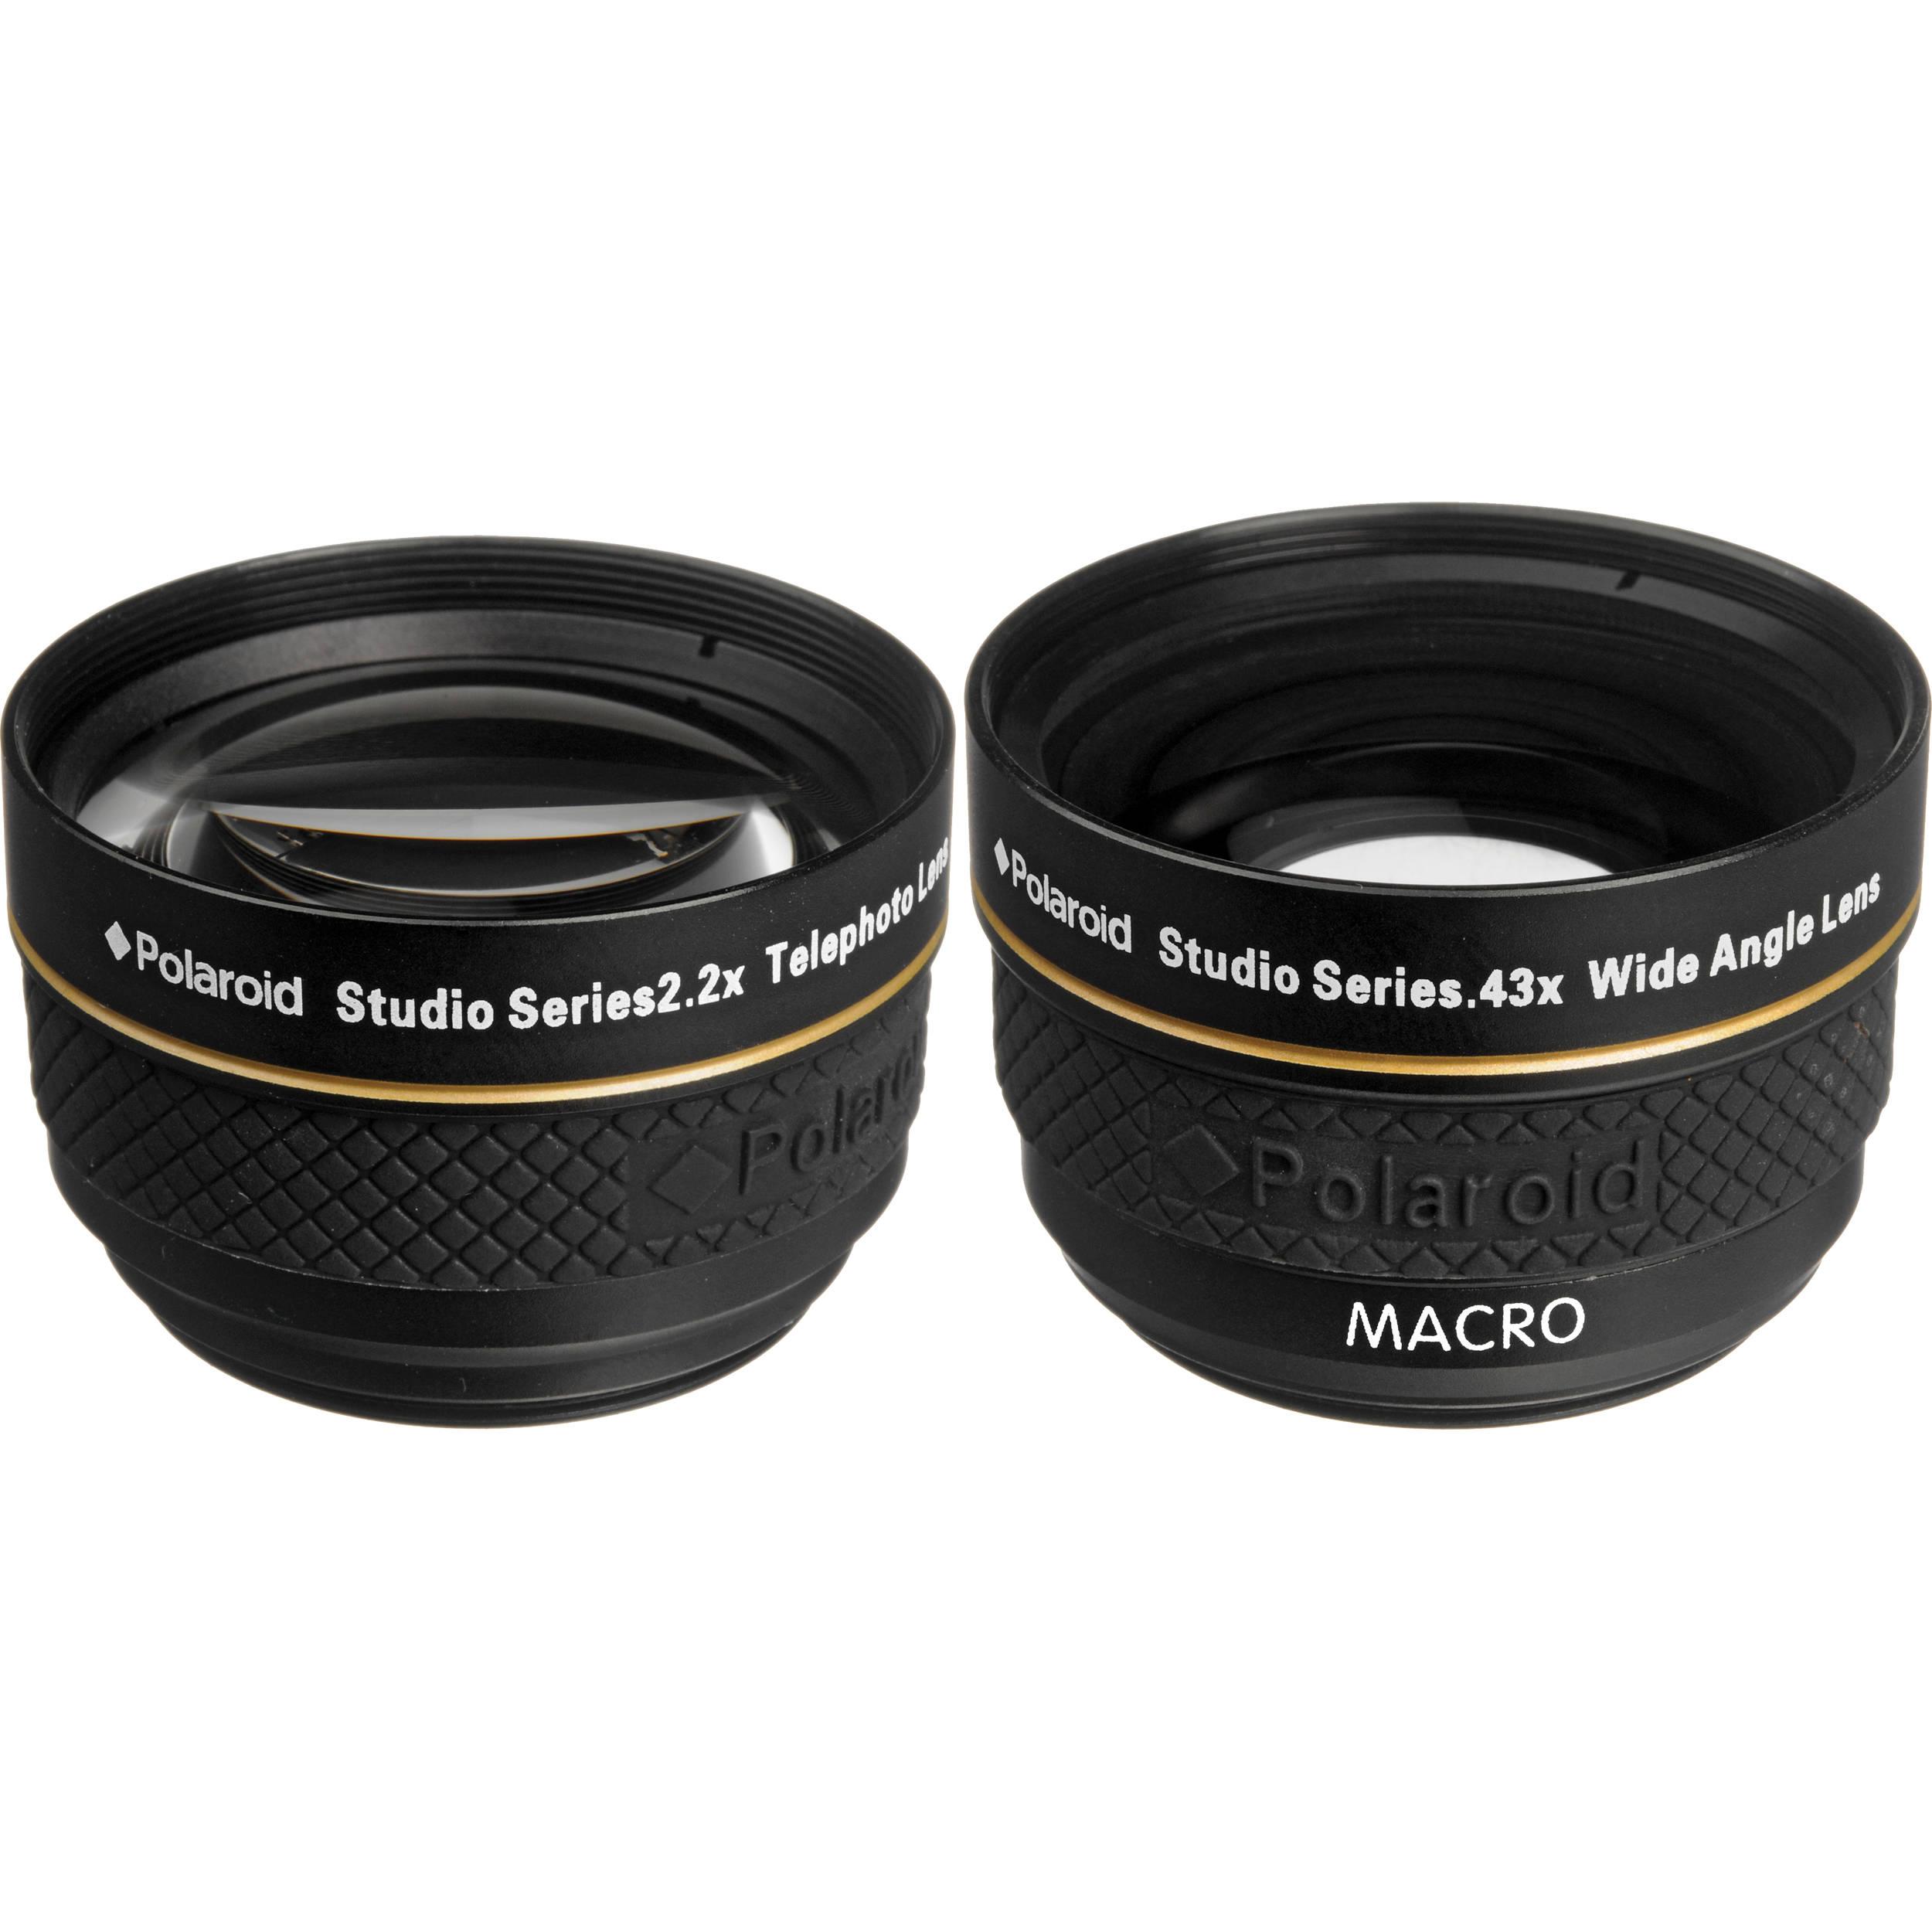 Polaroid Studio Series 37mm 22x Telephoto 043x Plkit37wt